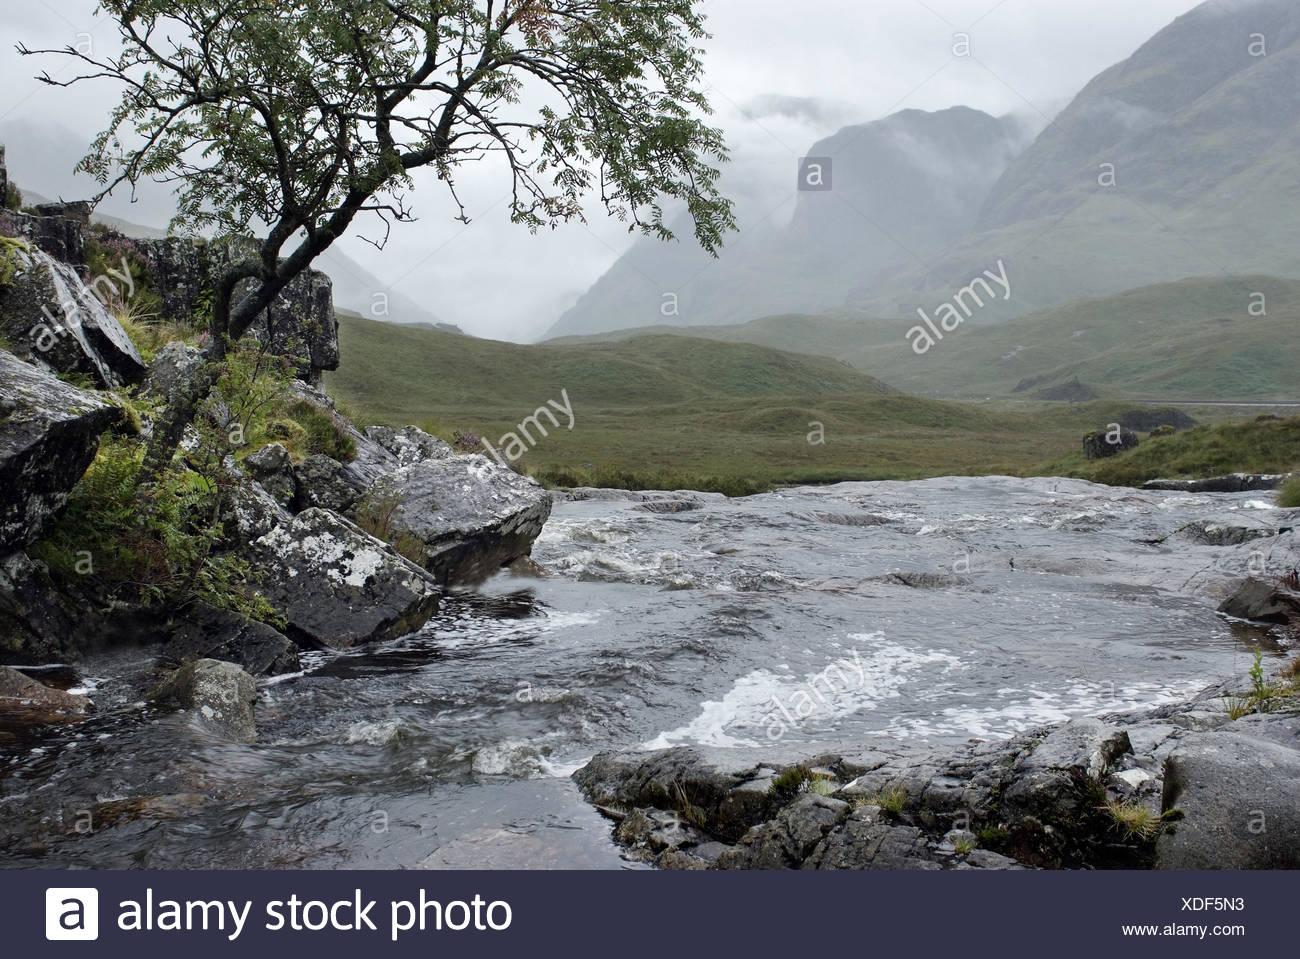 Great Britain, Scotland, Highlands, Grampian Mountains, Glen Coe Valley, rain, - Stock Image